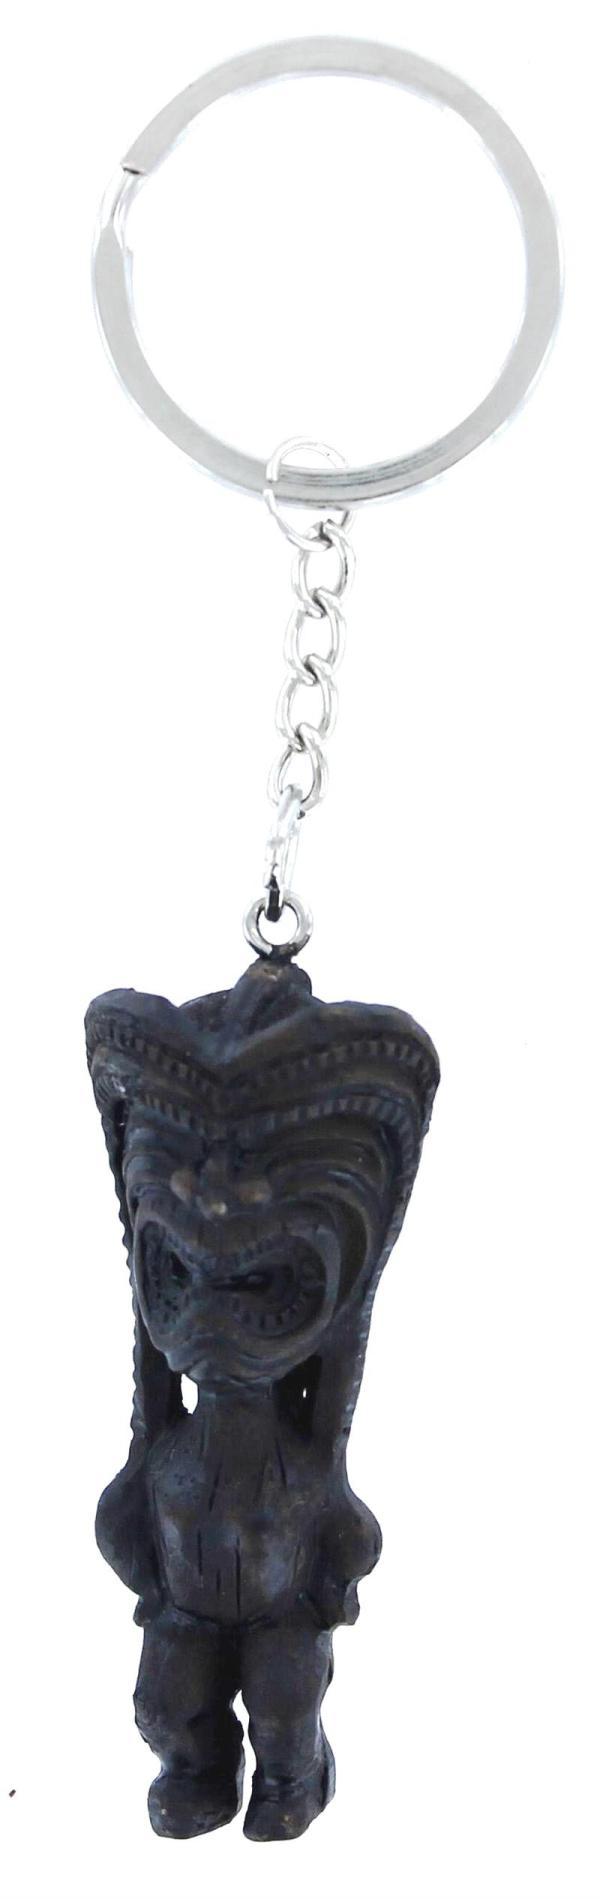 Hawaii Key Chain Keychain Tiki God Of Luck